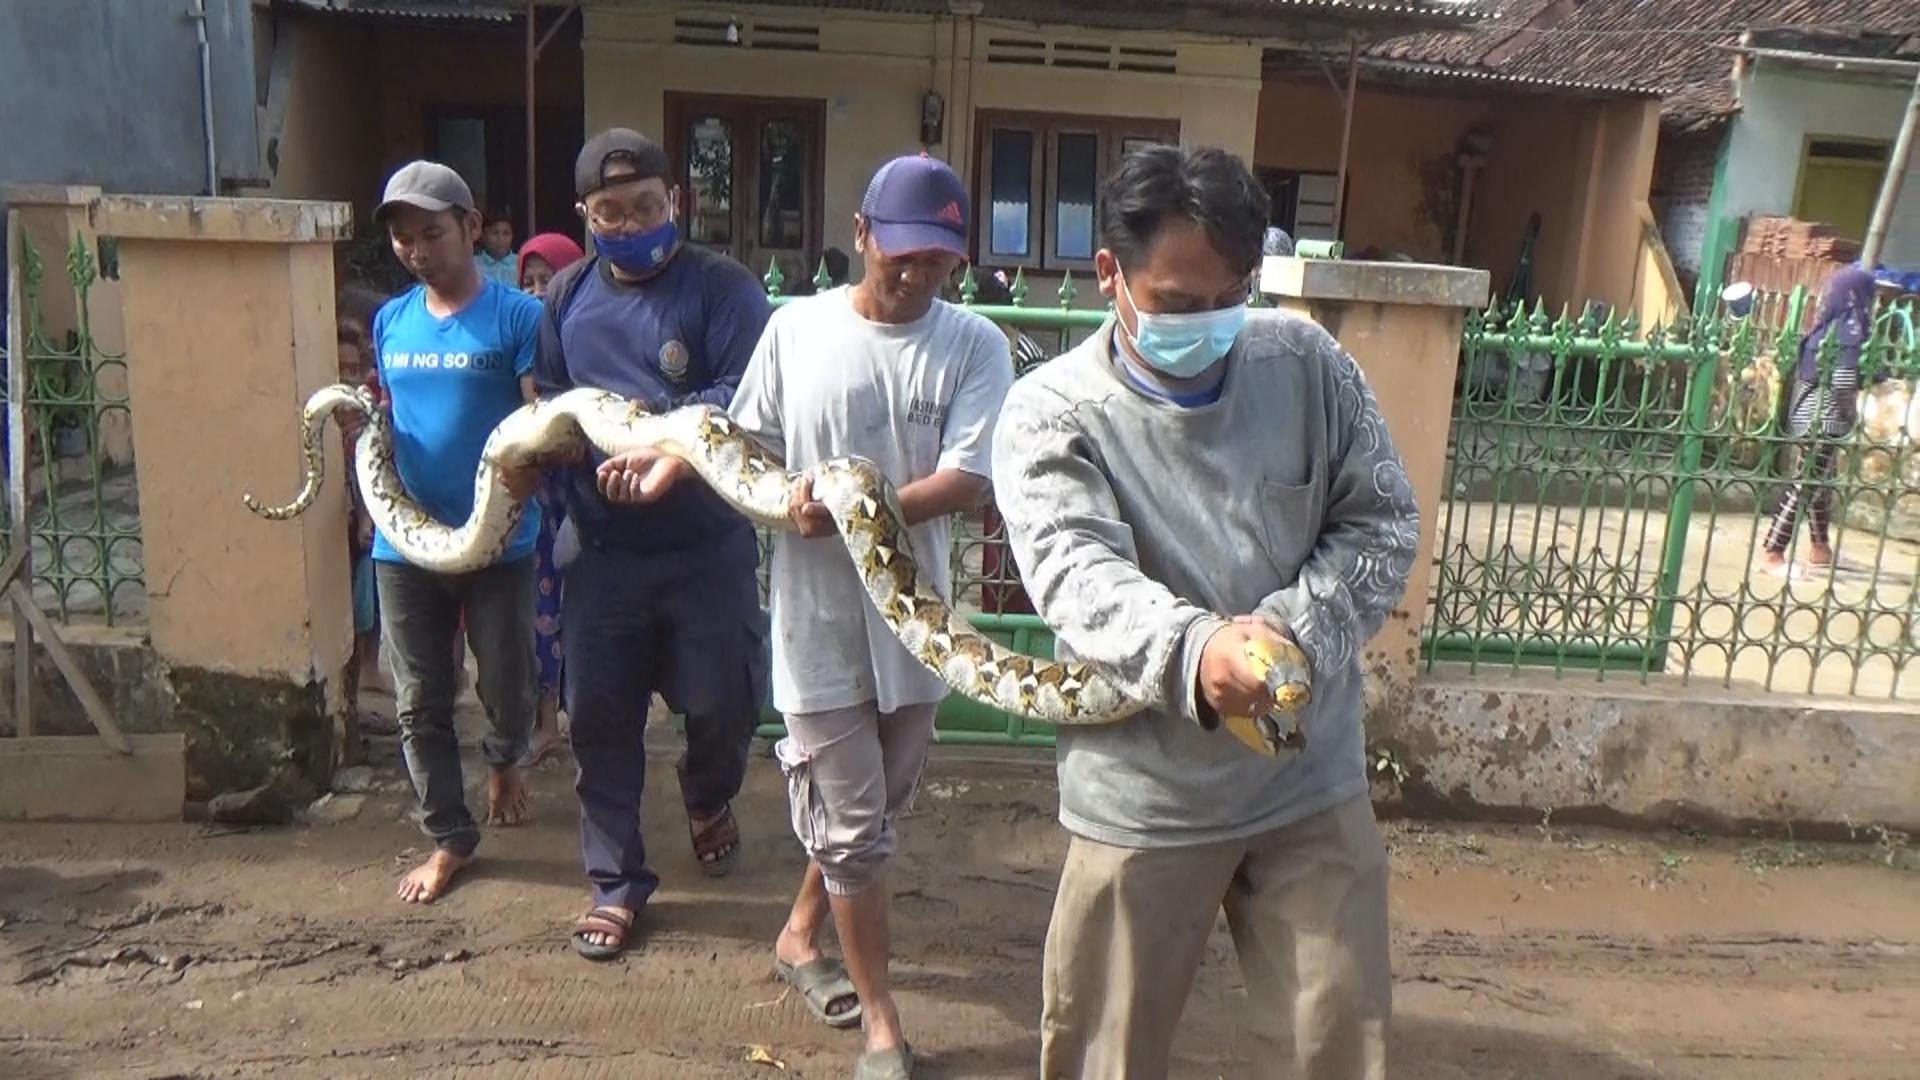 Heboh, Ular Sanca 4 Meter Berkeliaran di Halaman Rumah Warga Jombang